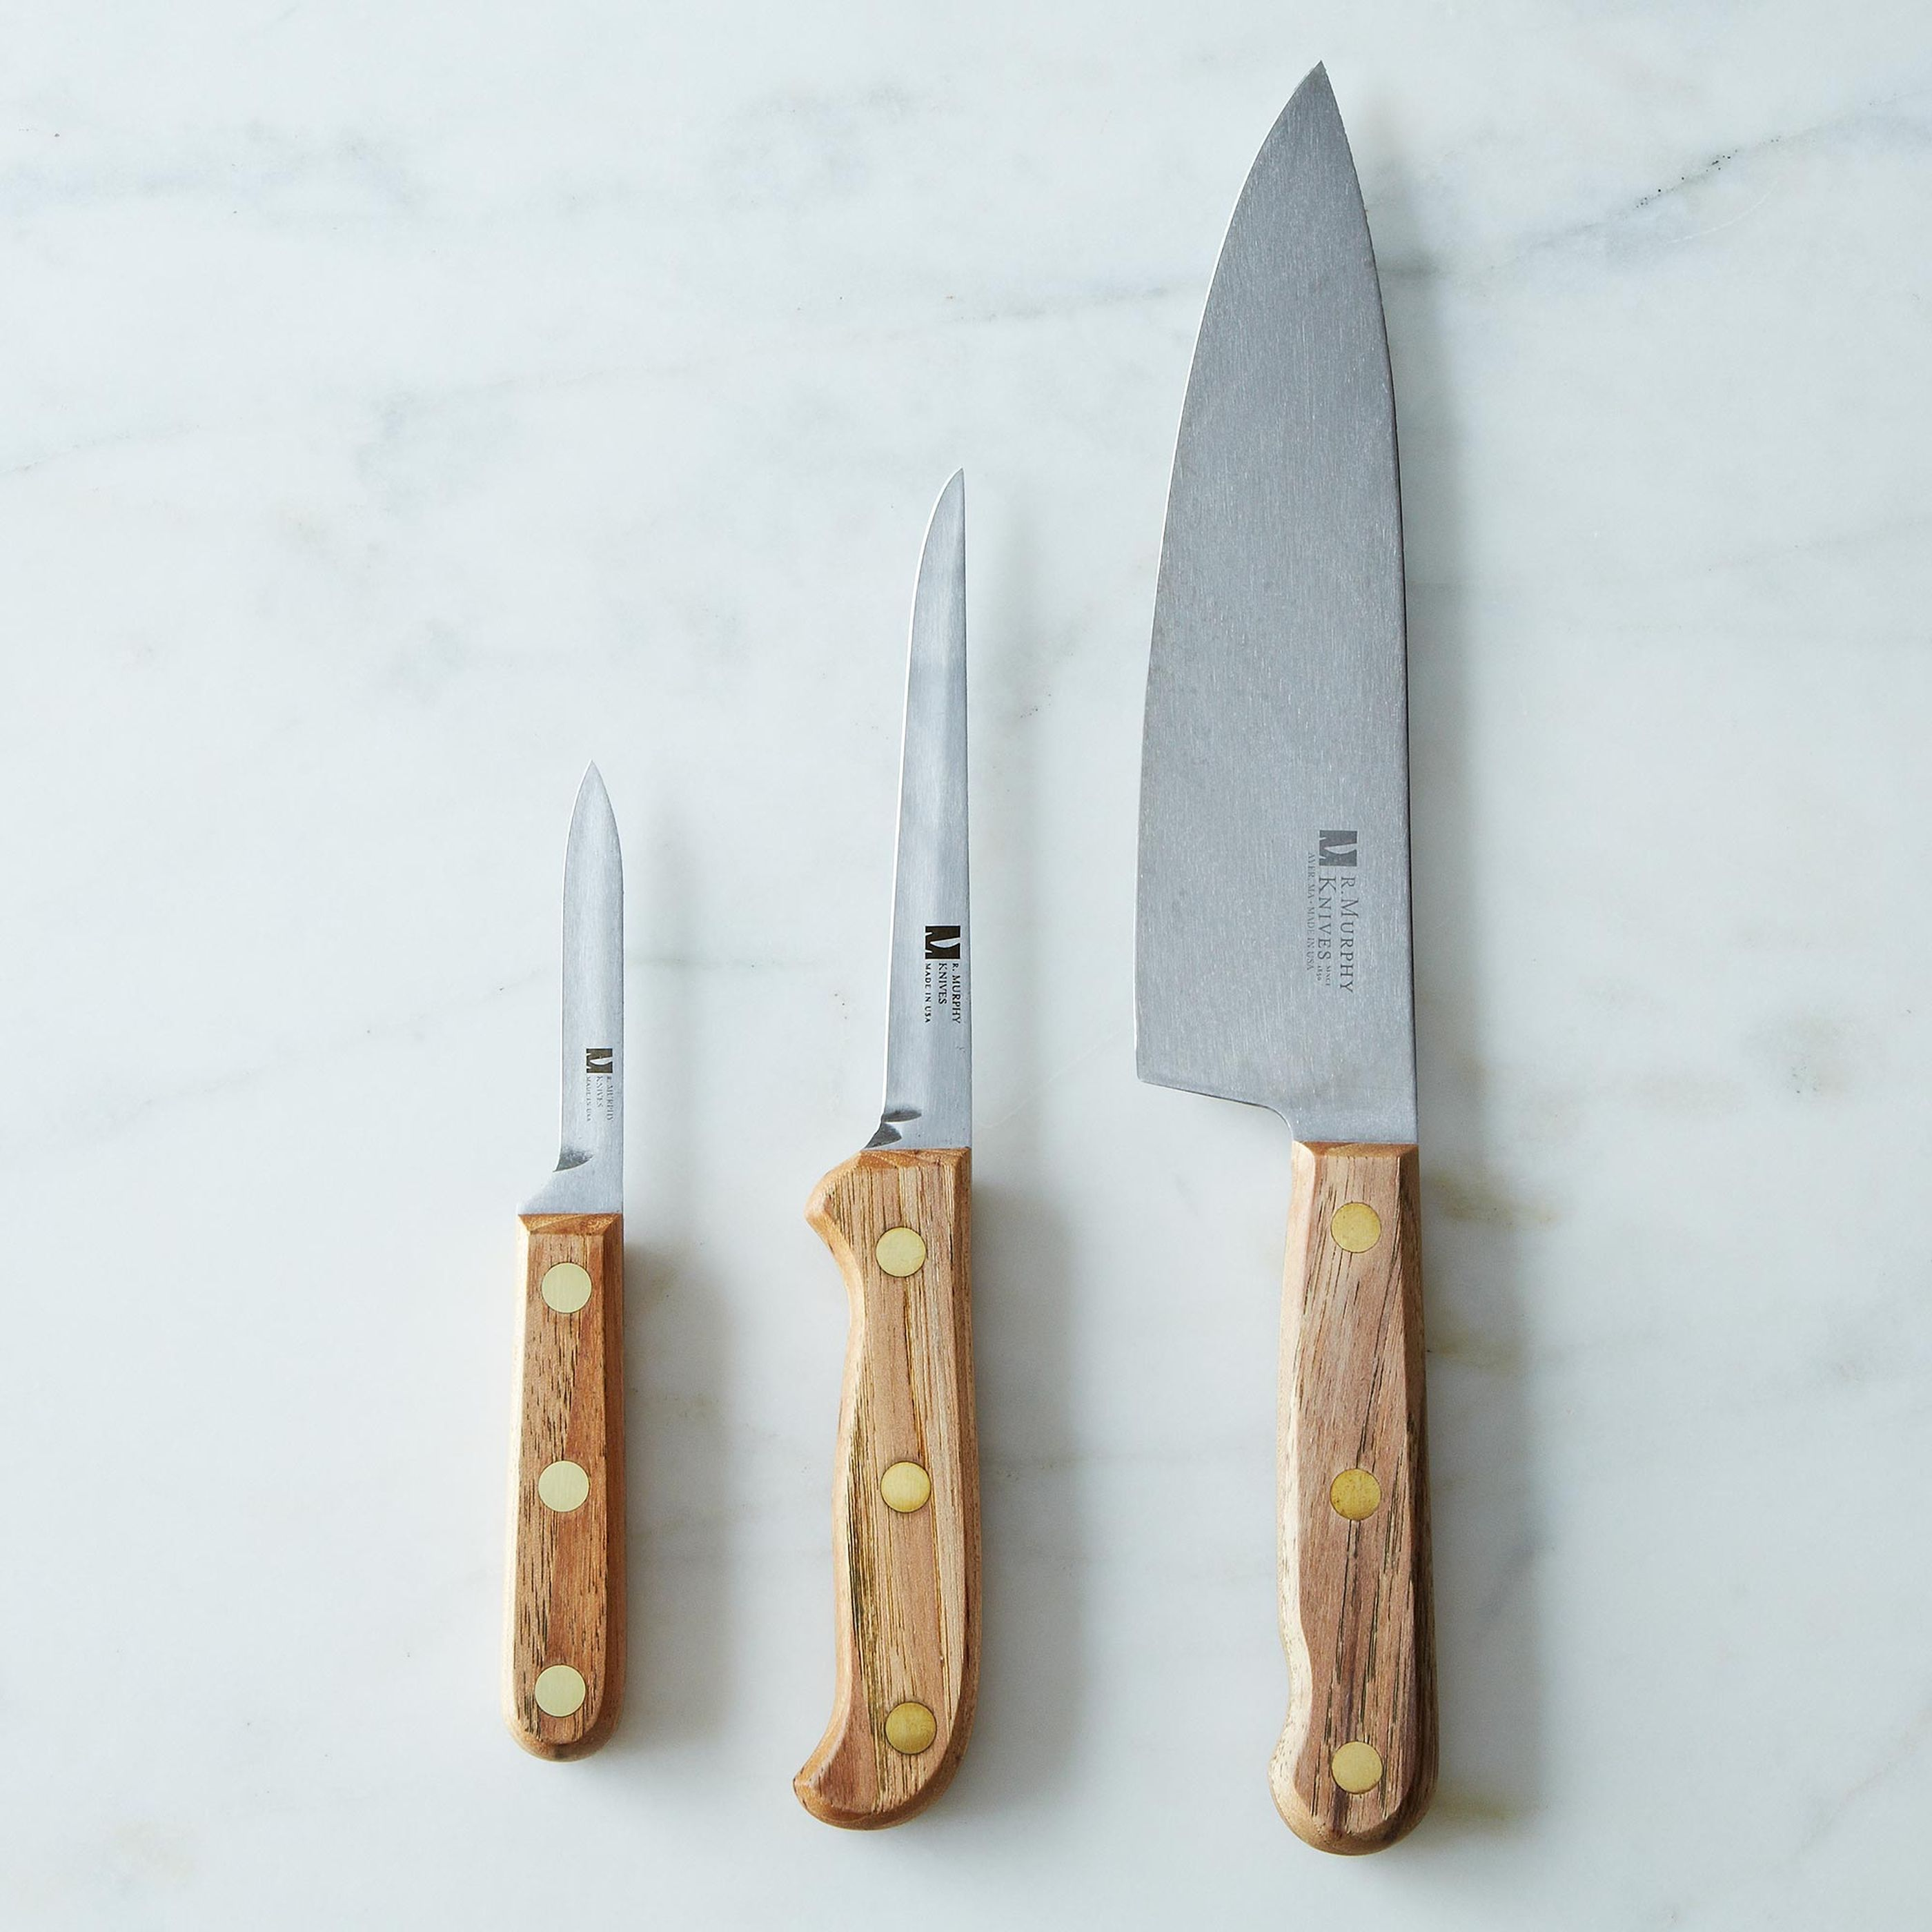 R. Murphy Reclaimed Wood Carbon Steel Knife on Food52